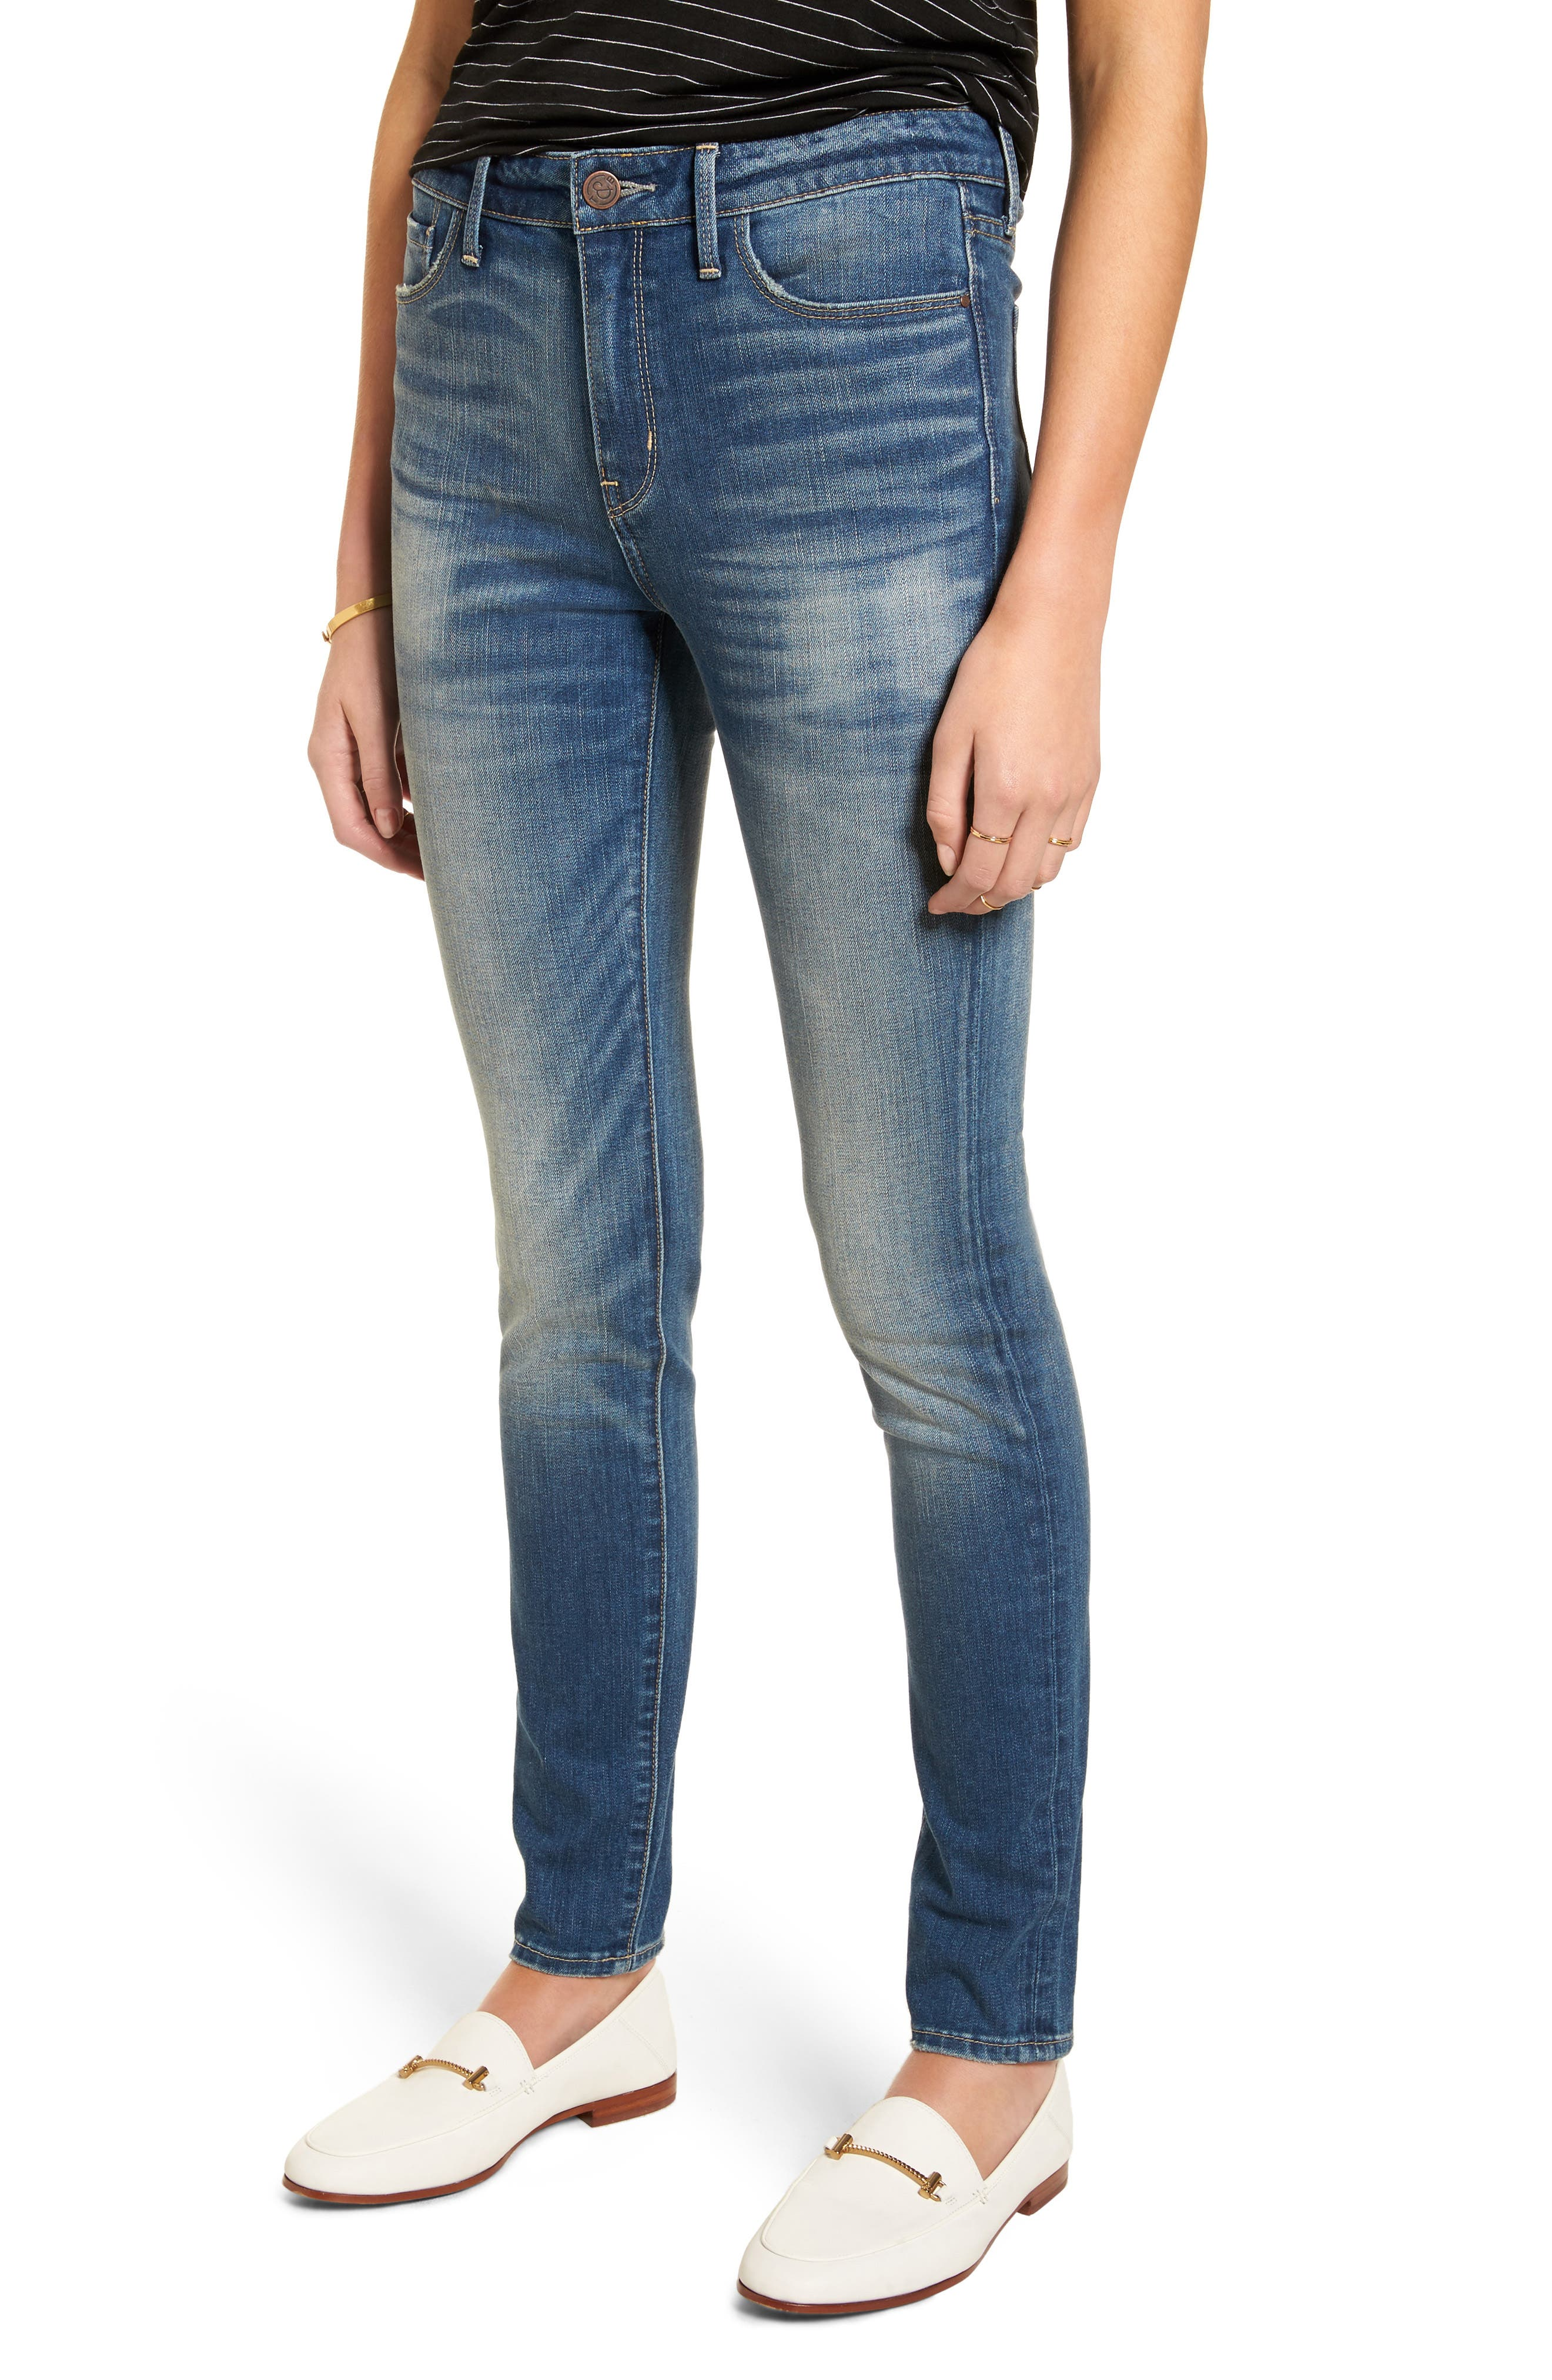 Main Image - Treasure & Bond High Waist Skinny Jeans (Rain Medium Worn)